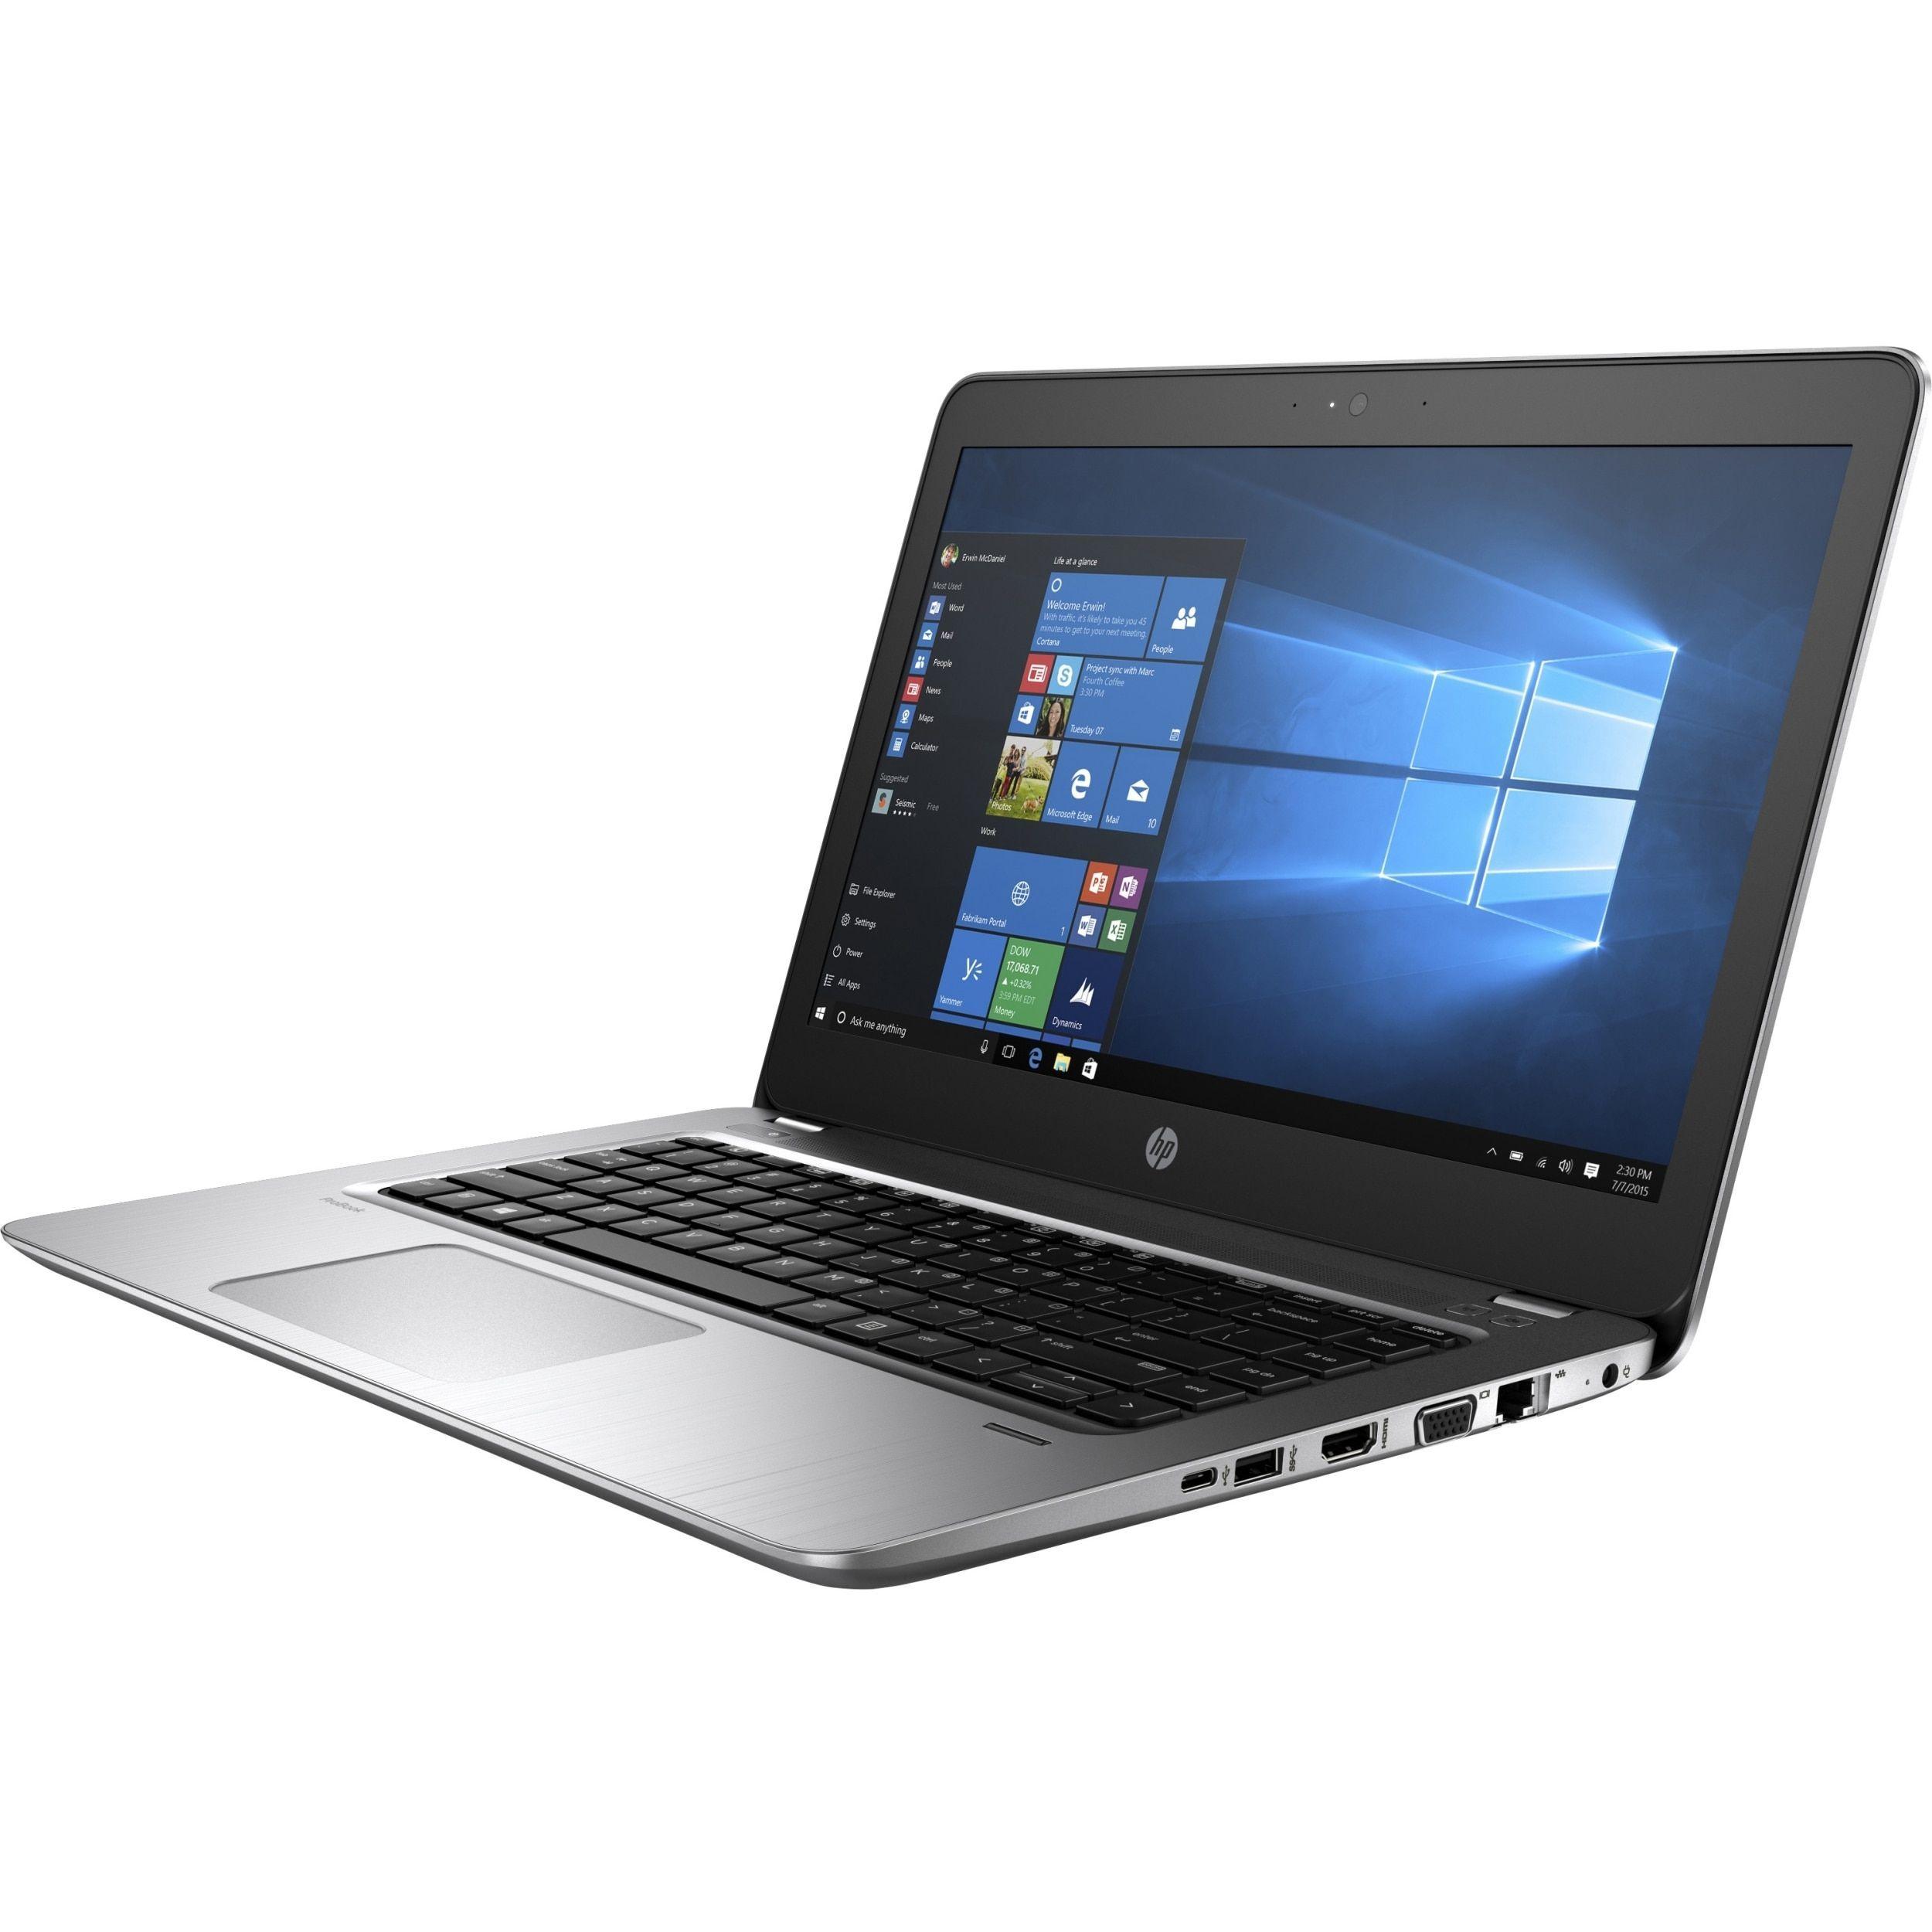 "HP ProBook 440 G4 14"" 16 9 Notebook 1366 x 768 Intel Core i5"